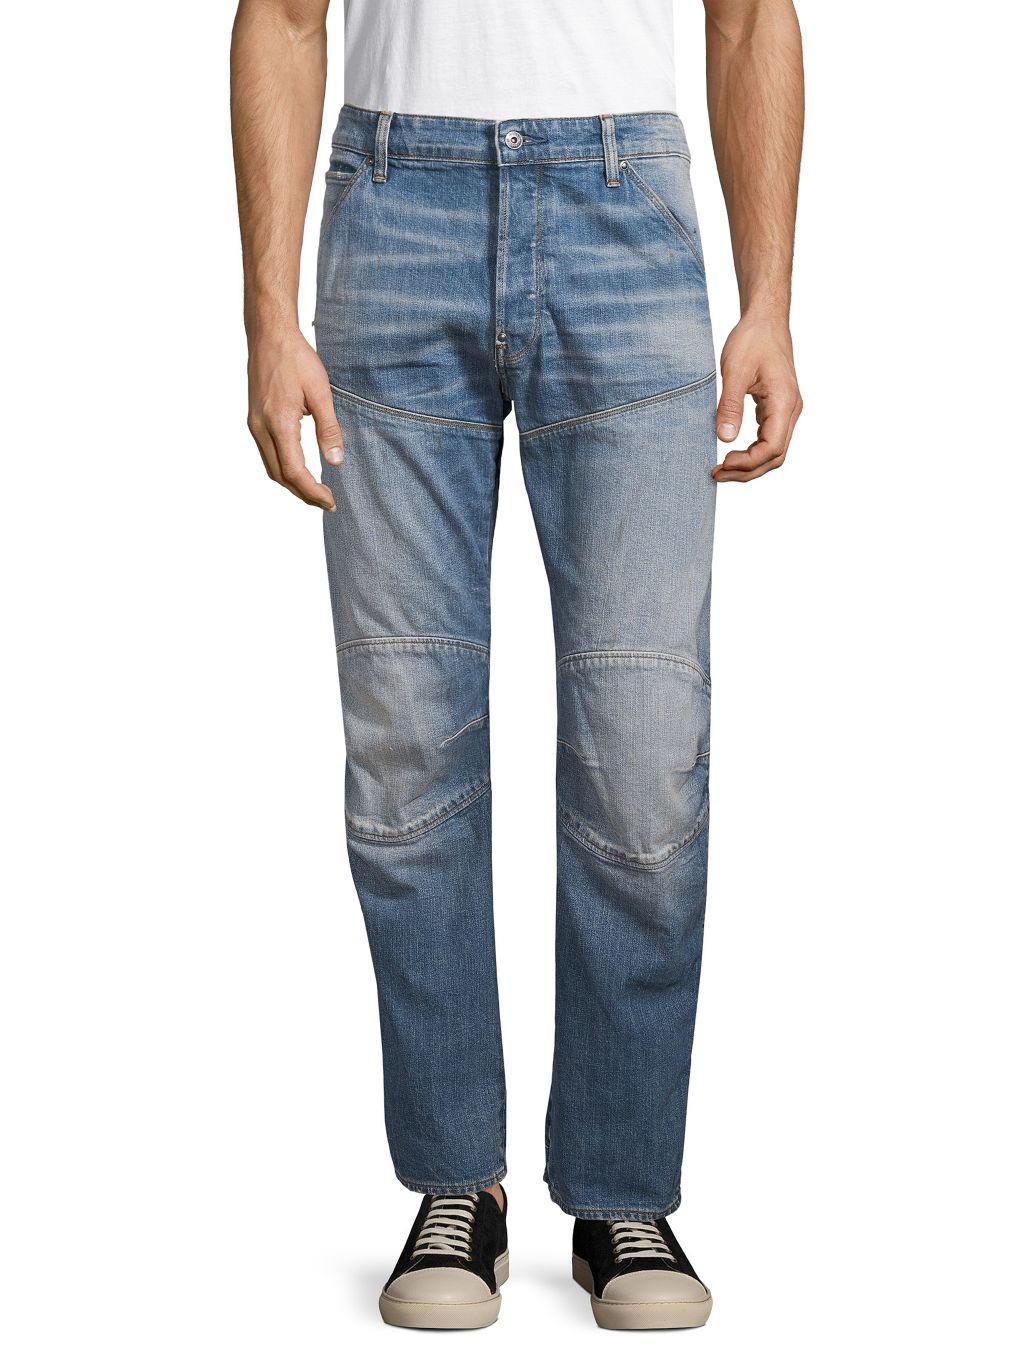 G-Star RAW 5620 3D Straight Jeans